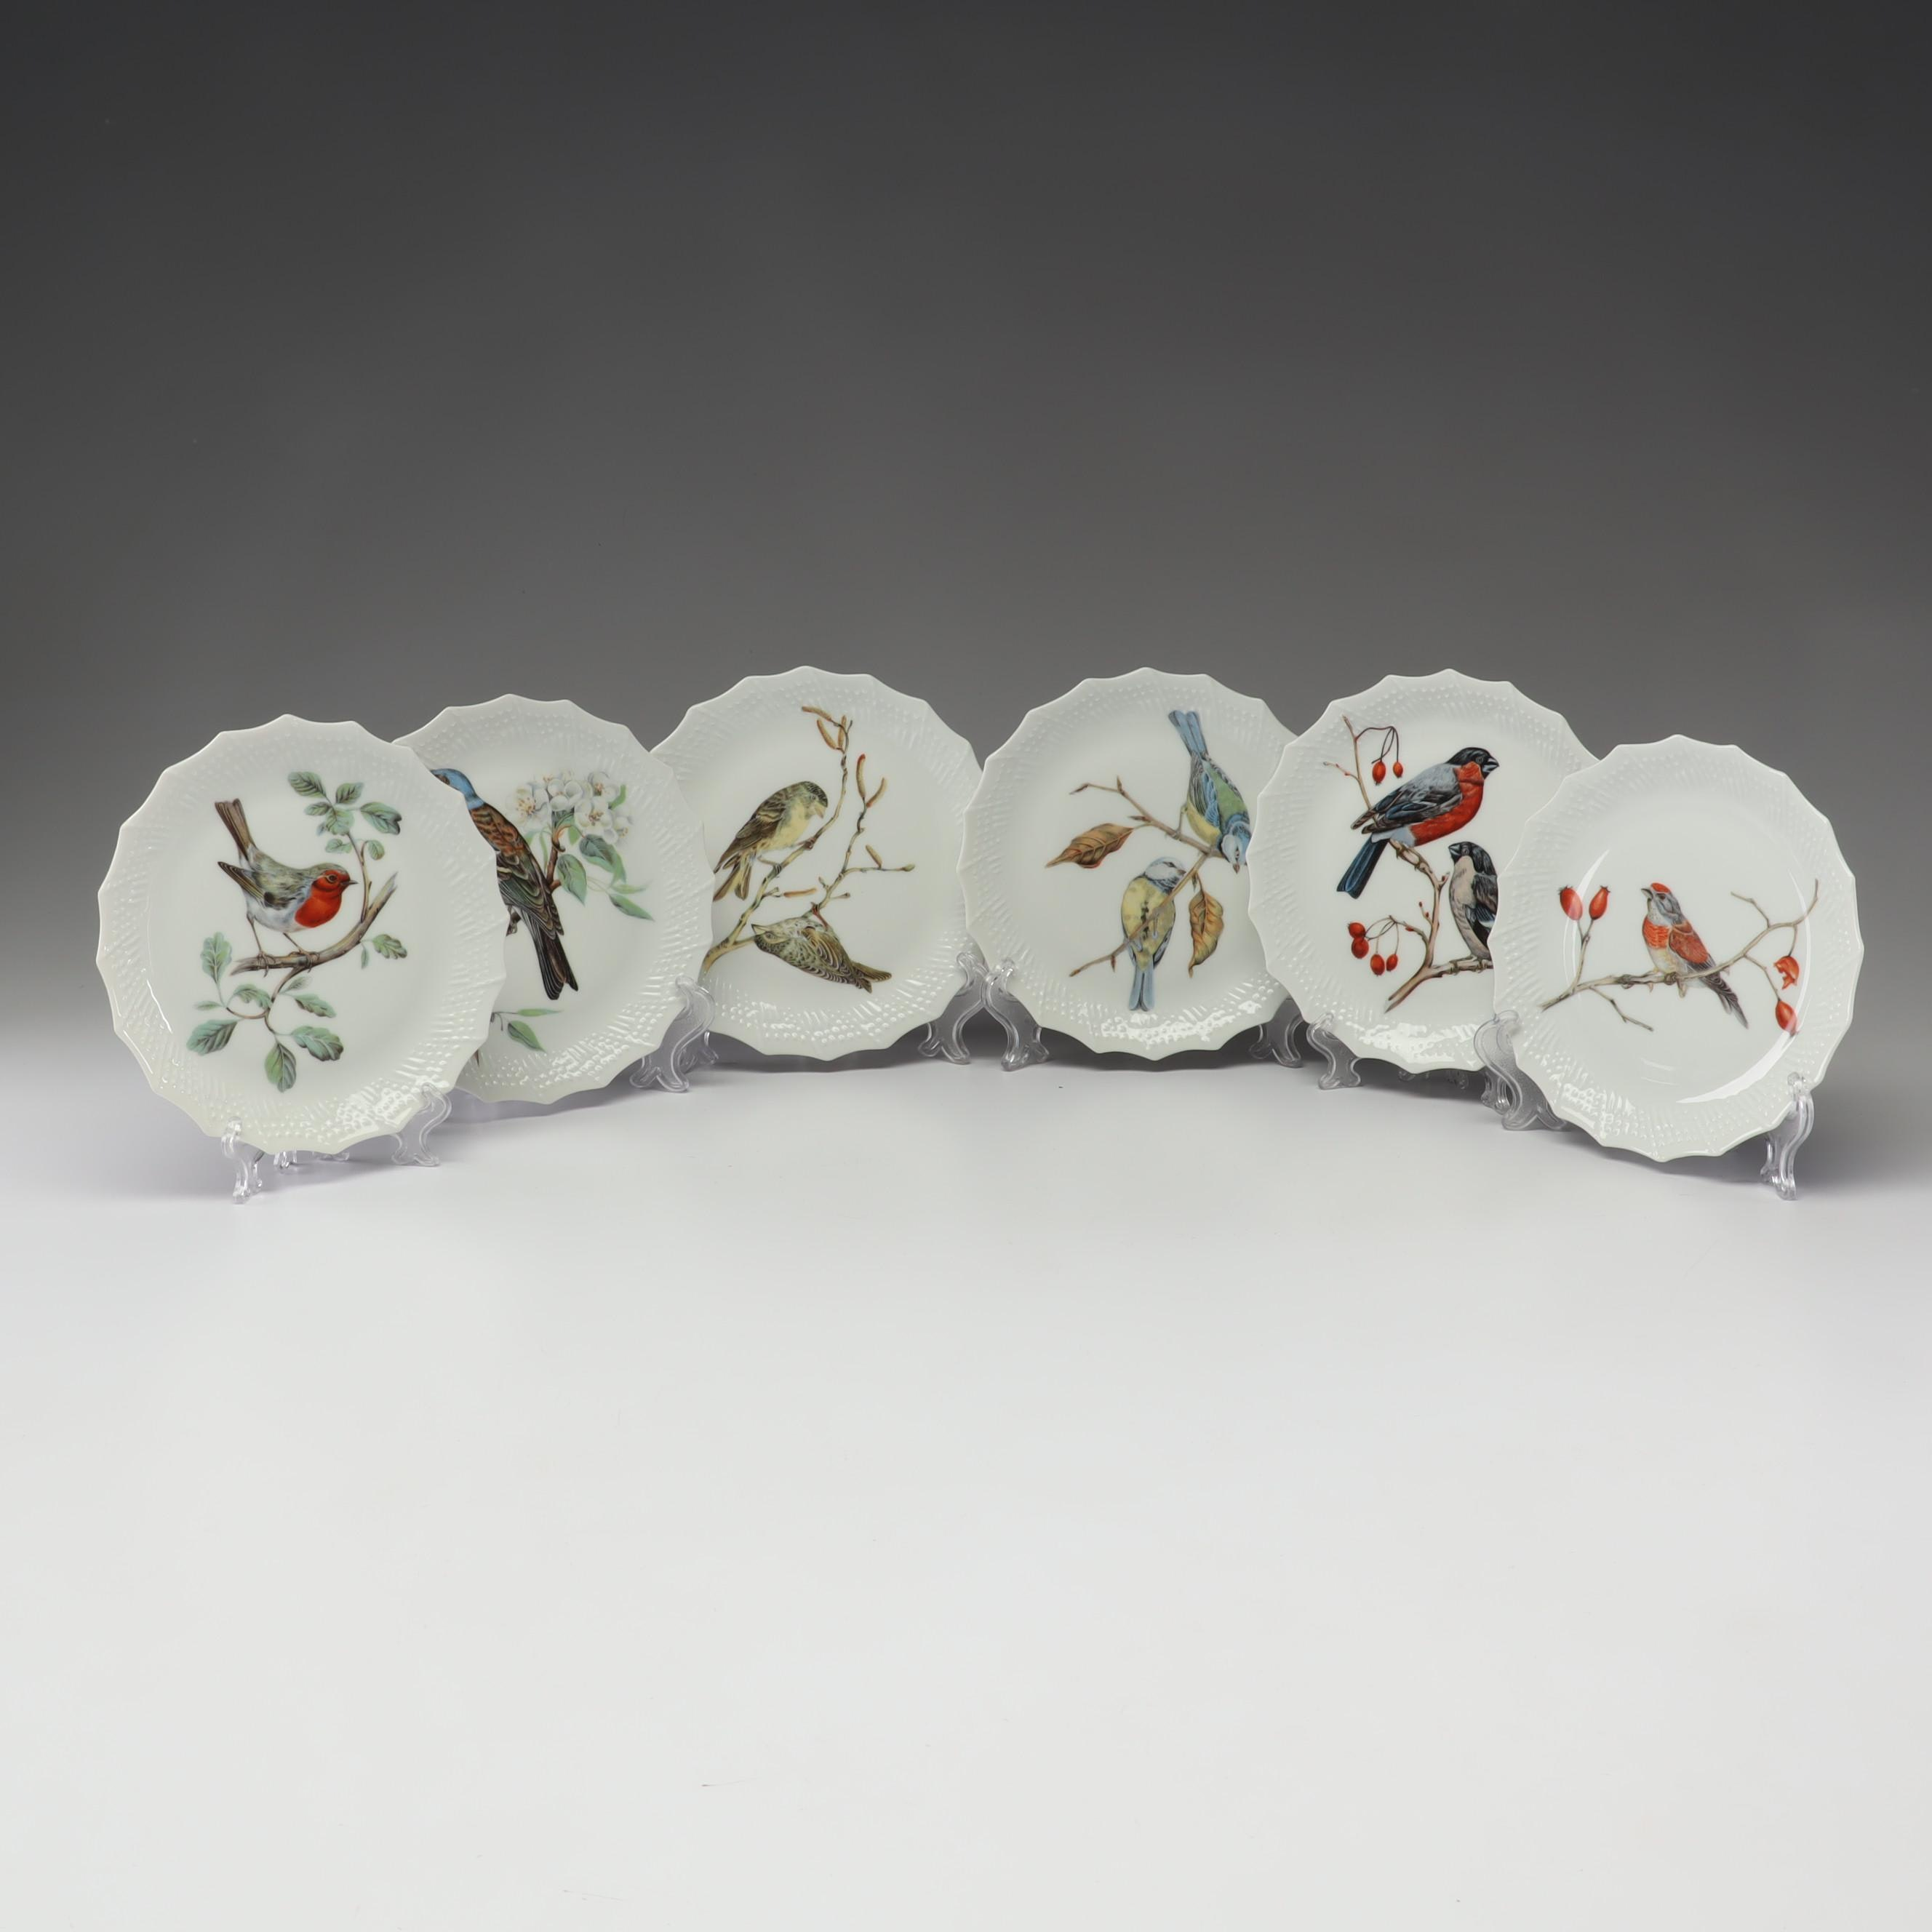 Limoges Porcelain Bird Motif Plates